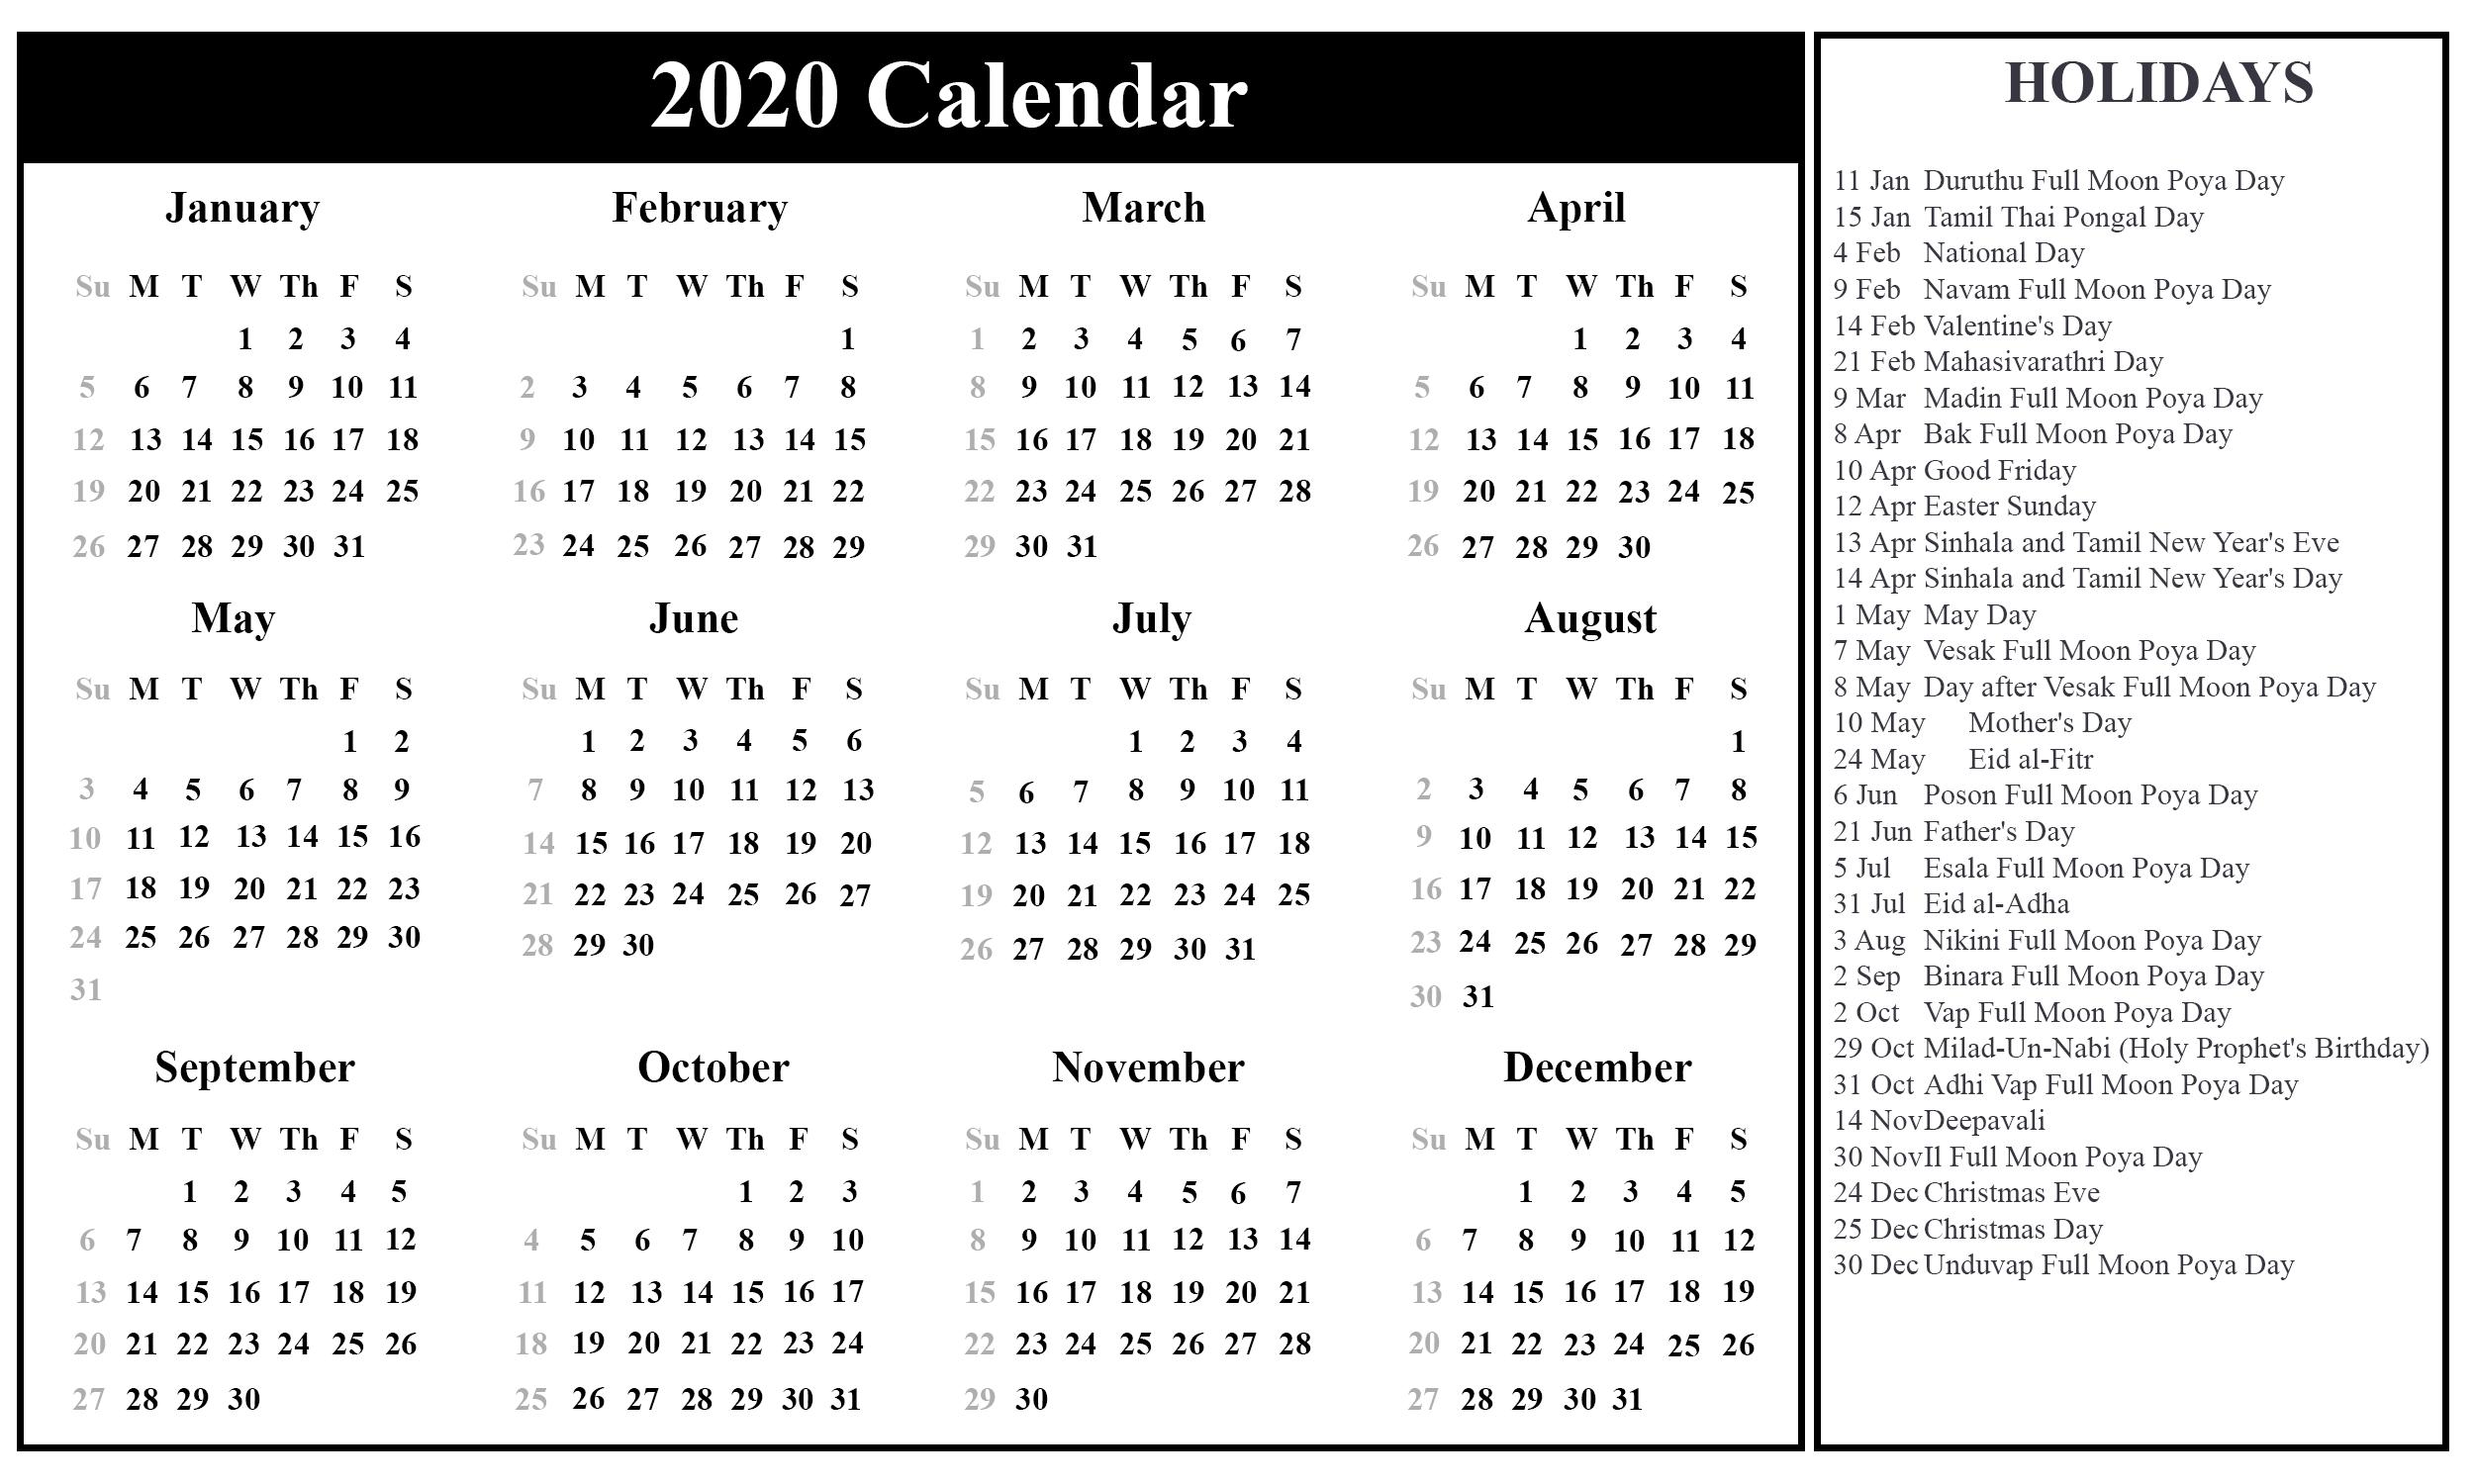 Free Blank Sri Lanka Calendar 2020 In Pdf, Excel & Word Format